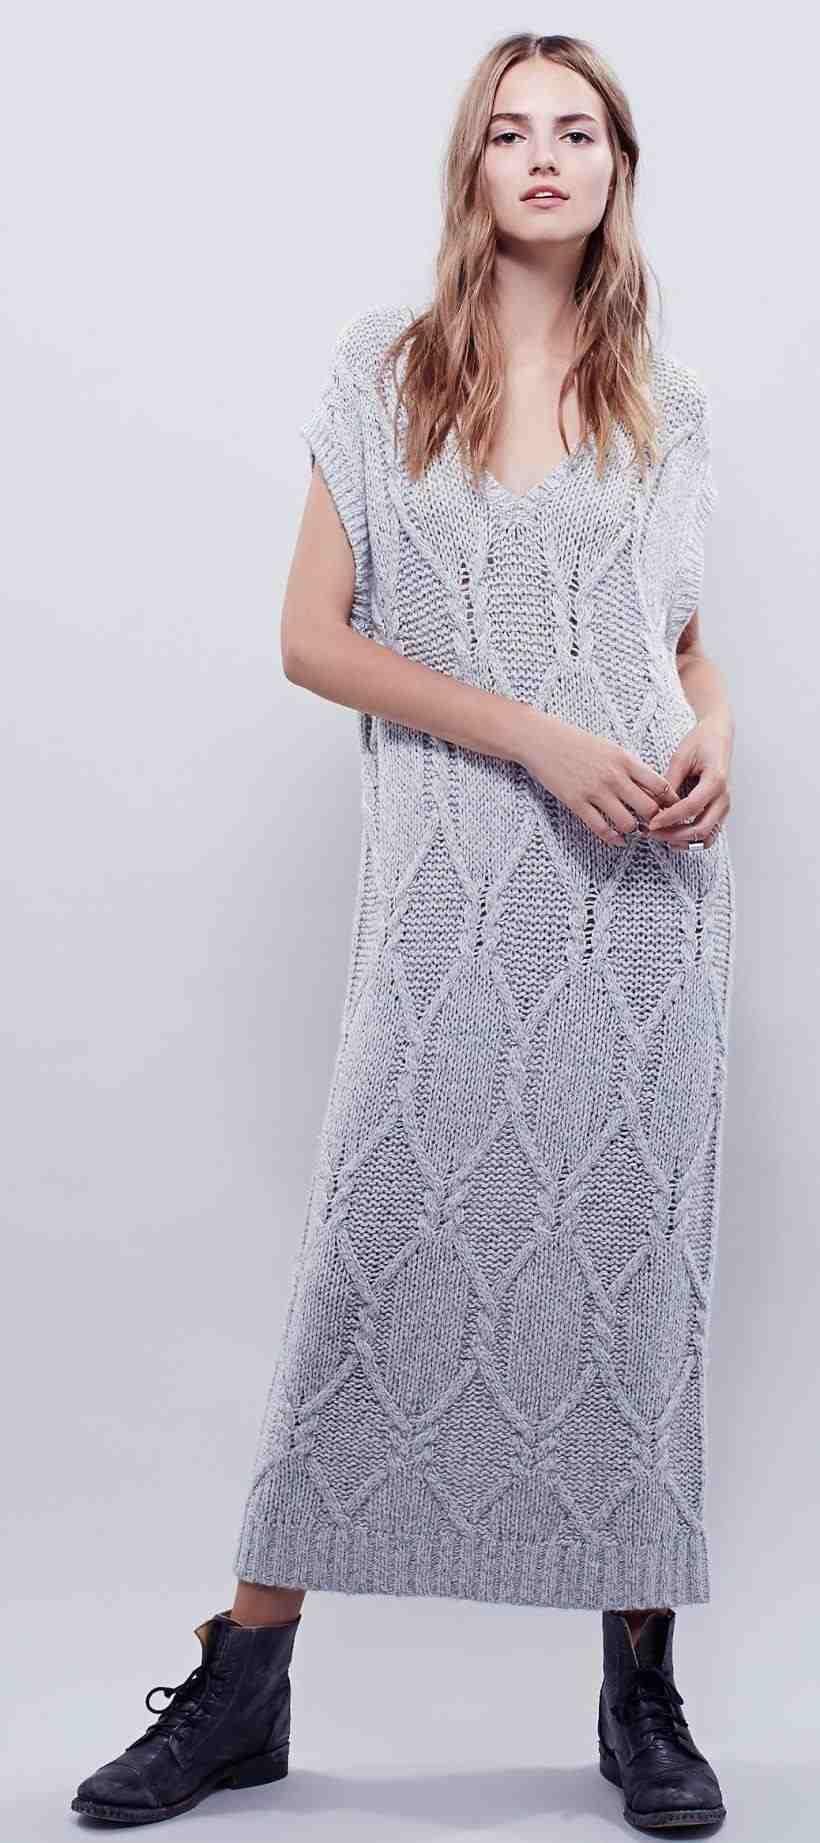 1aa9ba2820e732 Crochet Maxi Dress Pattern Free - 1970s crochet maxi dress w diamond  patterned bodice. view in gallery boho maxi dress. 10+ free crochet and  fabric dress ...